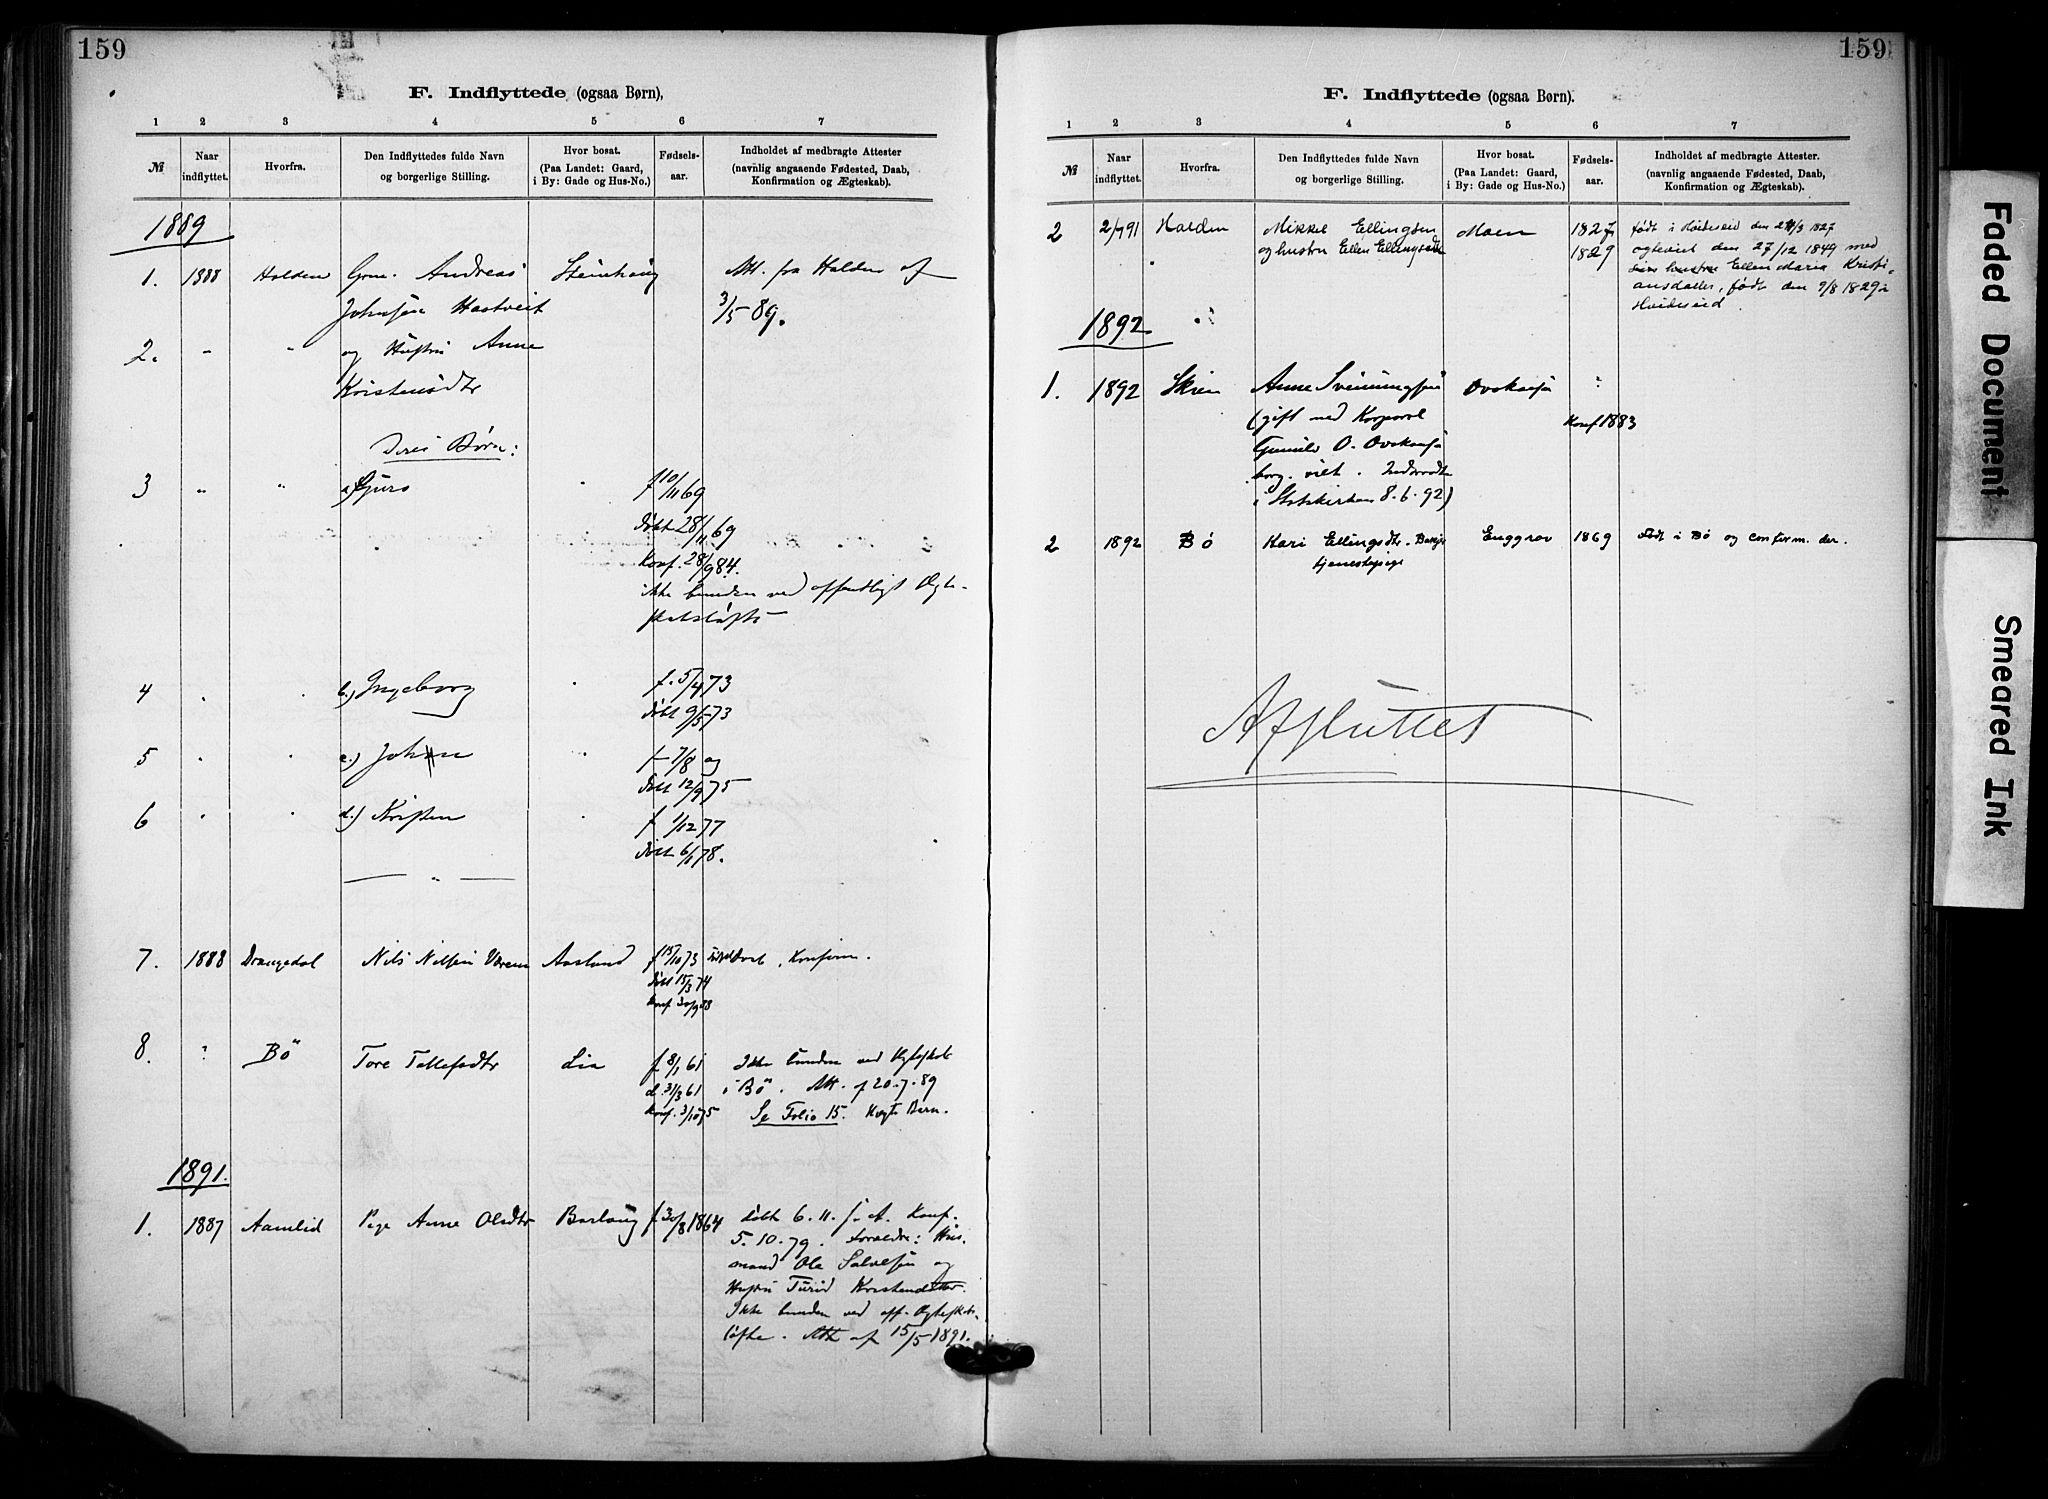 SAKO, Lunde kirkebøker, F/Fa/L0002: Ministerialbok nr. I 2, 1884-1892, s. 159